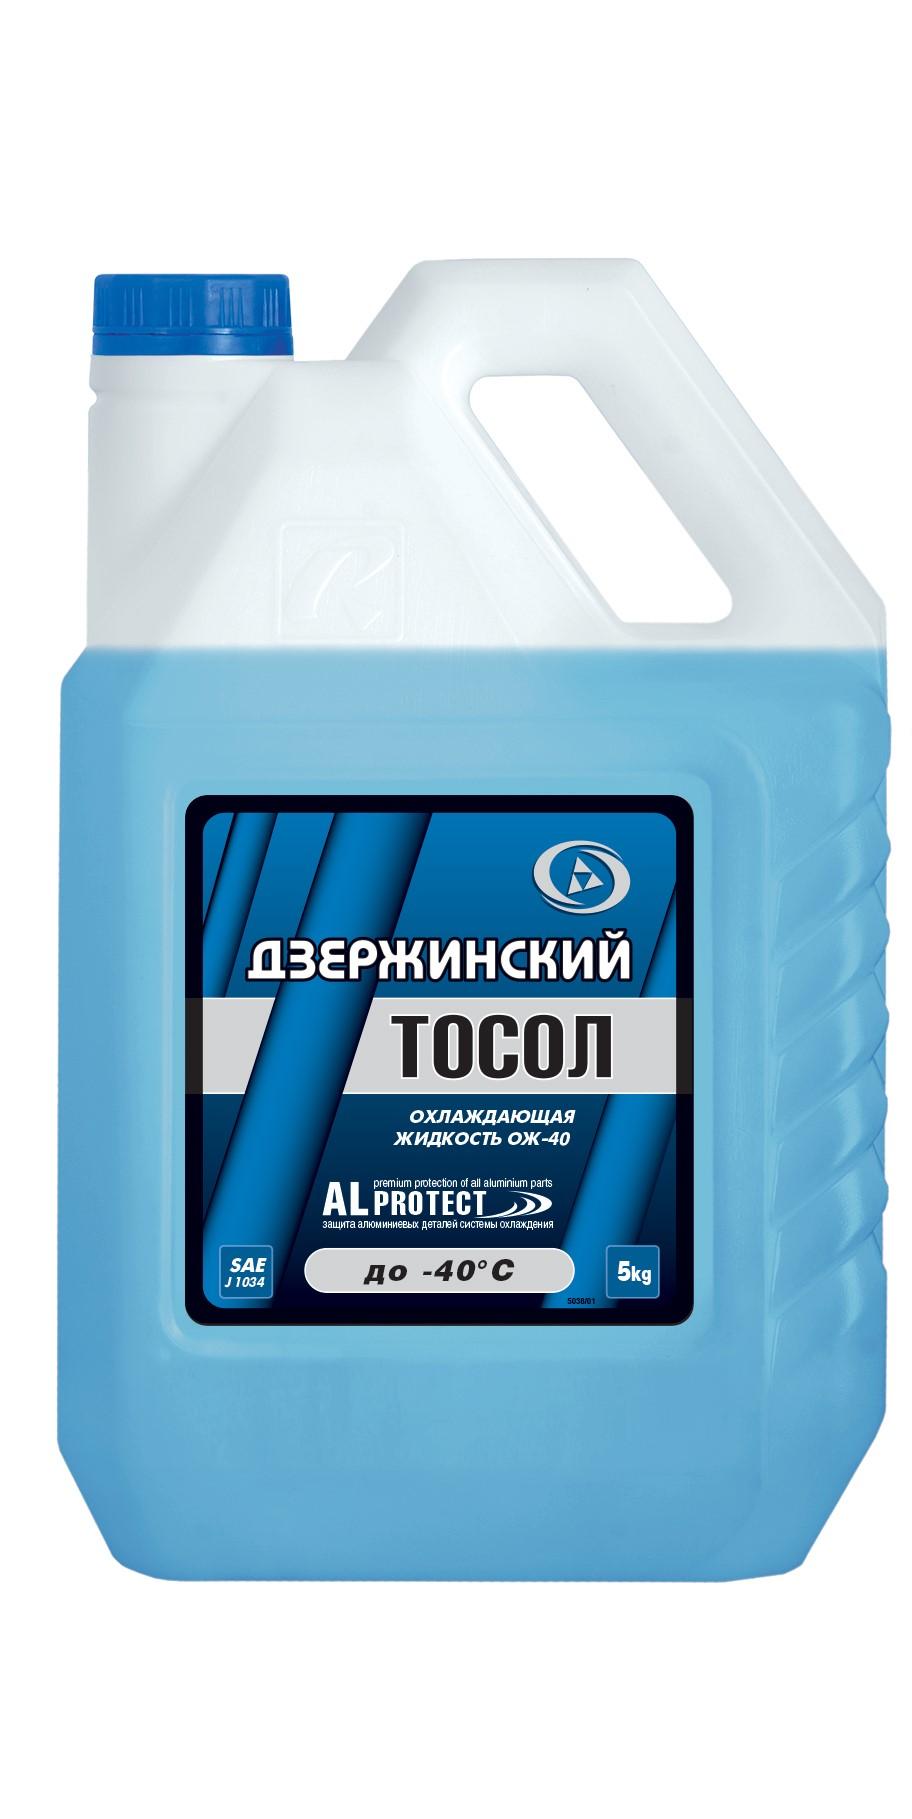 OILRIGHT 5038П Тосол Дзержинский ОЖ-40 5 кг